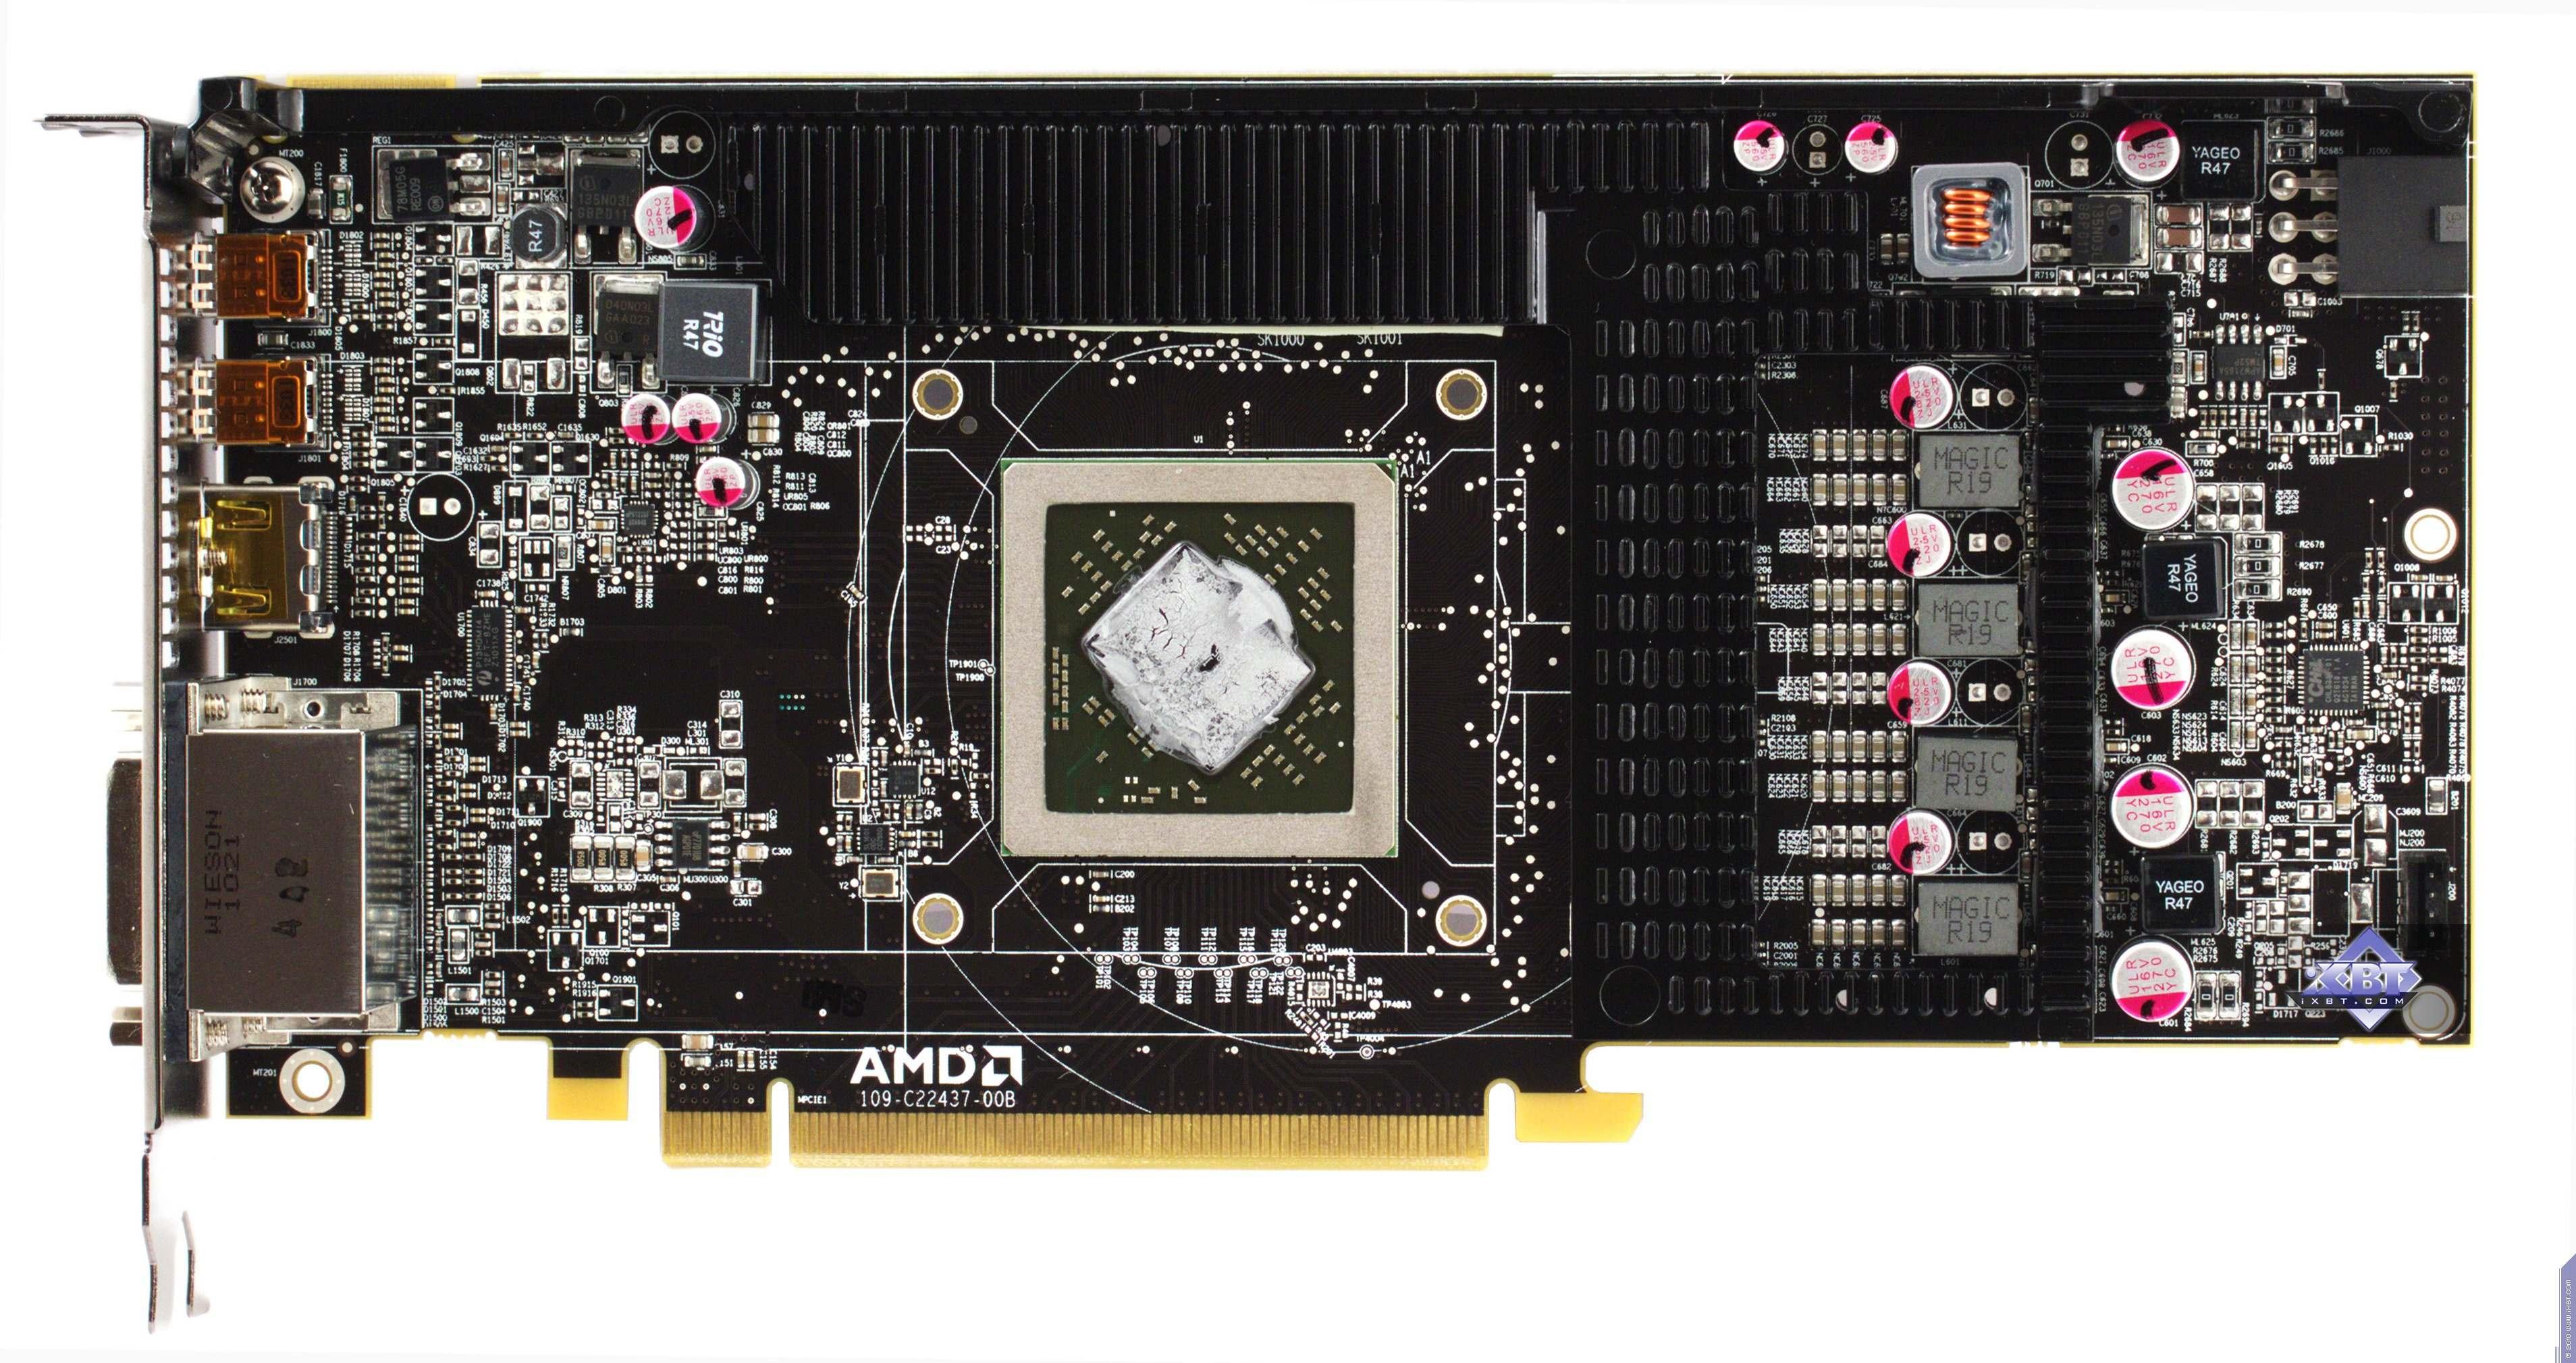 AMD RADEON HD 7000M DISPLAY DRIVERS WINDOWS